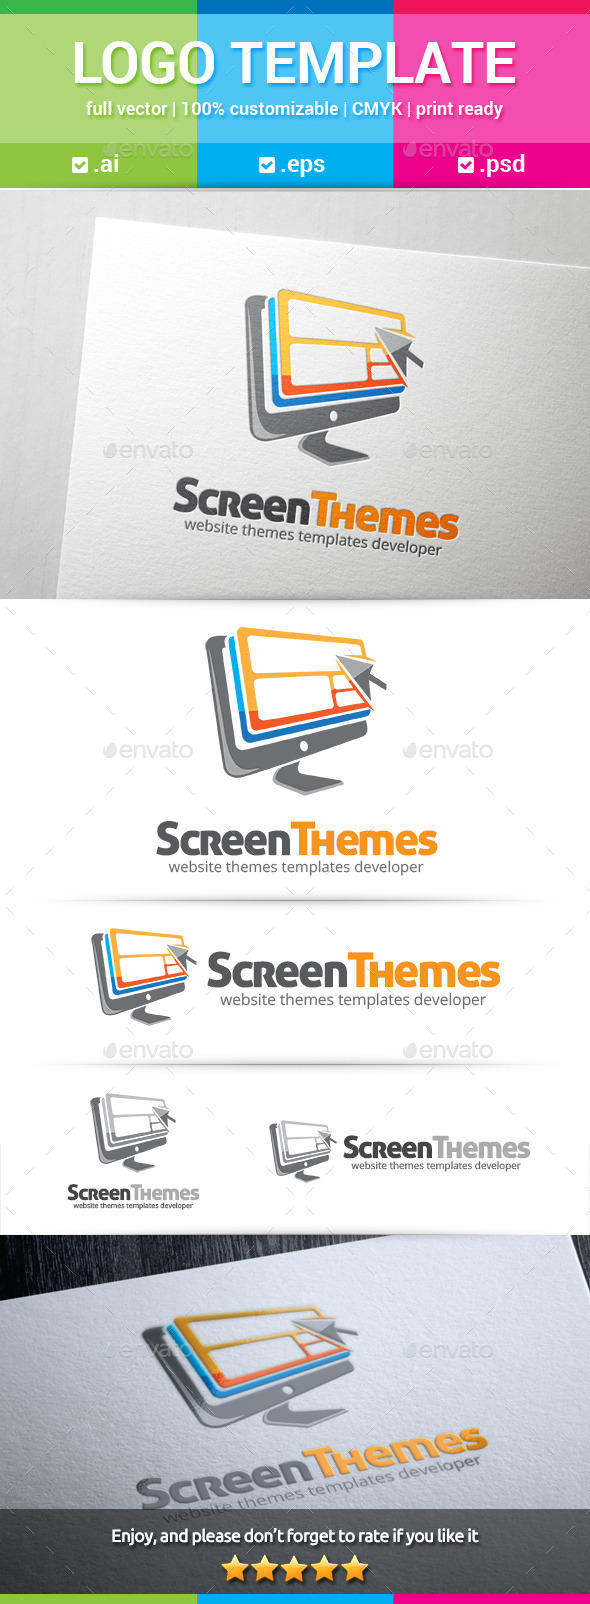 GraphicRiver Screen Theme Logo 10549372